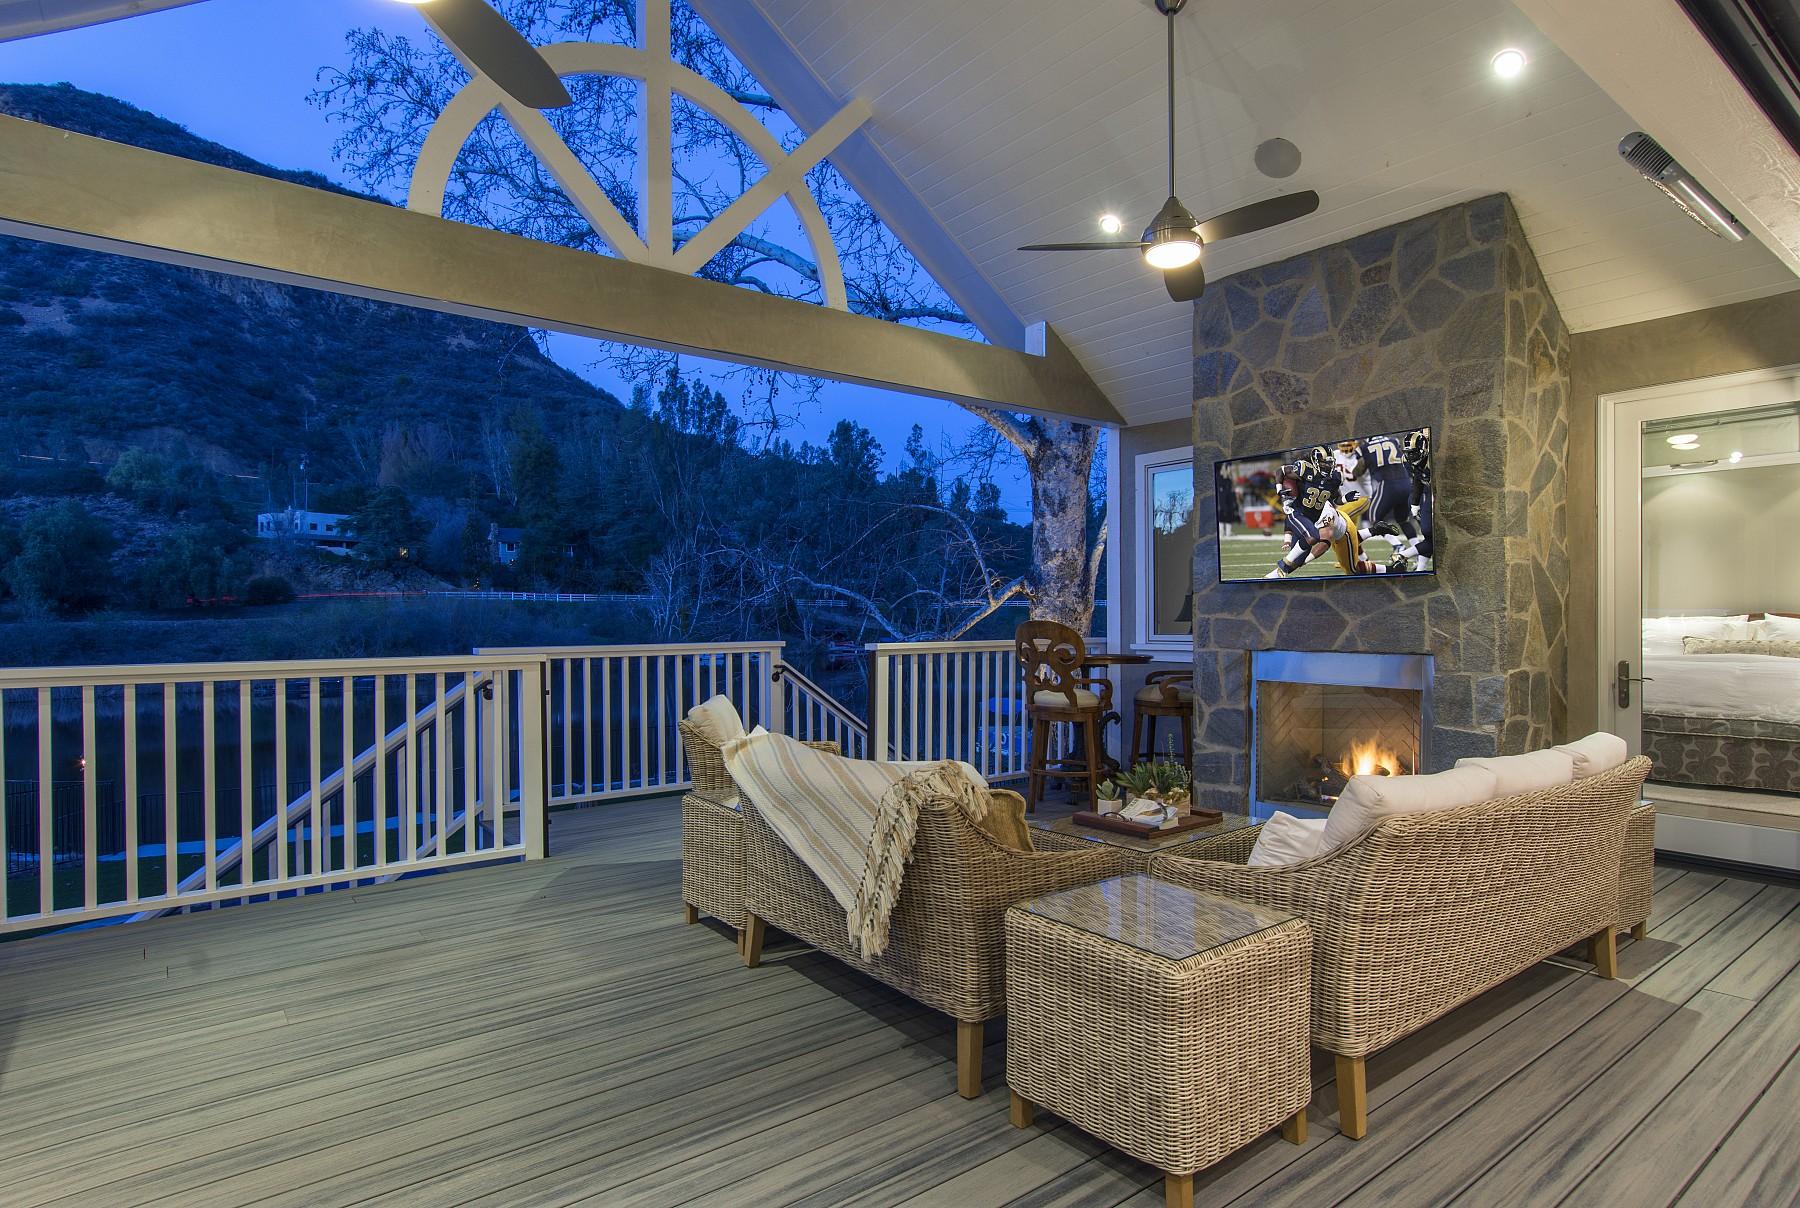 29235 S. Lakeshore Drive, Agoura Hills, CA 91301